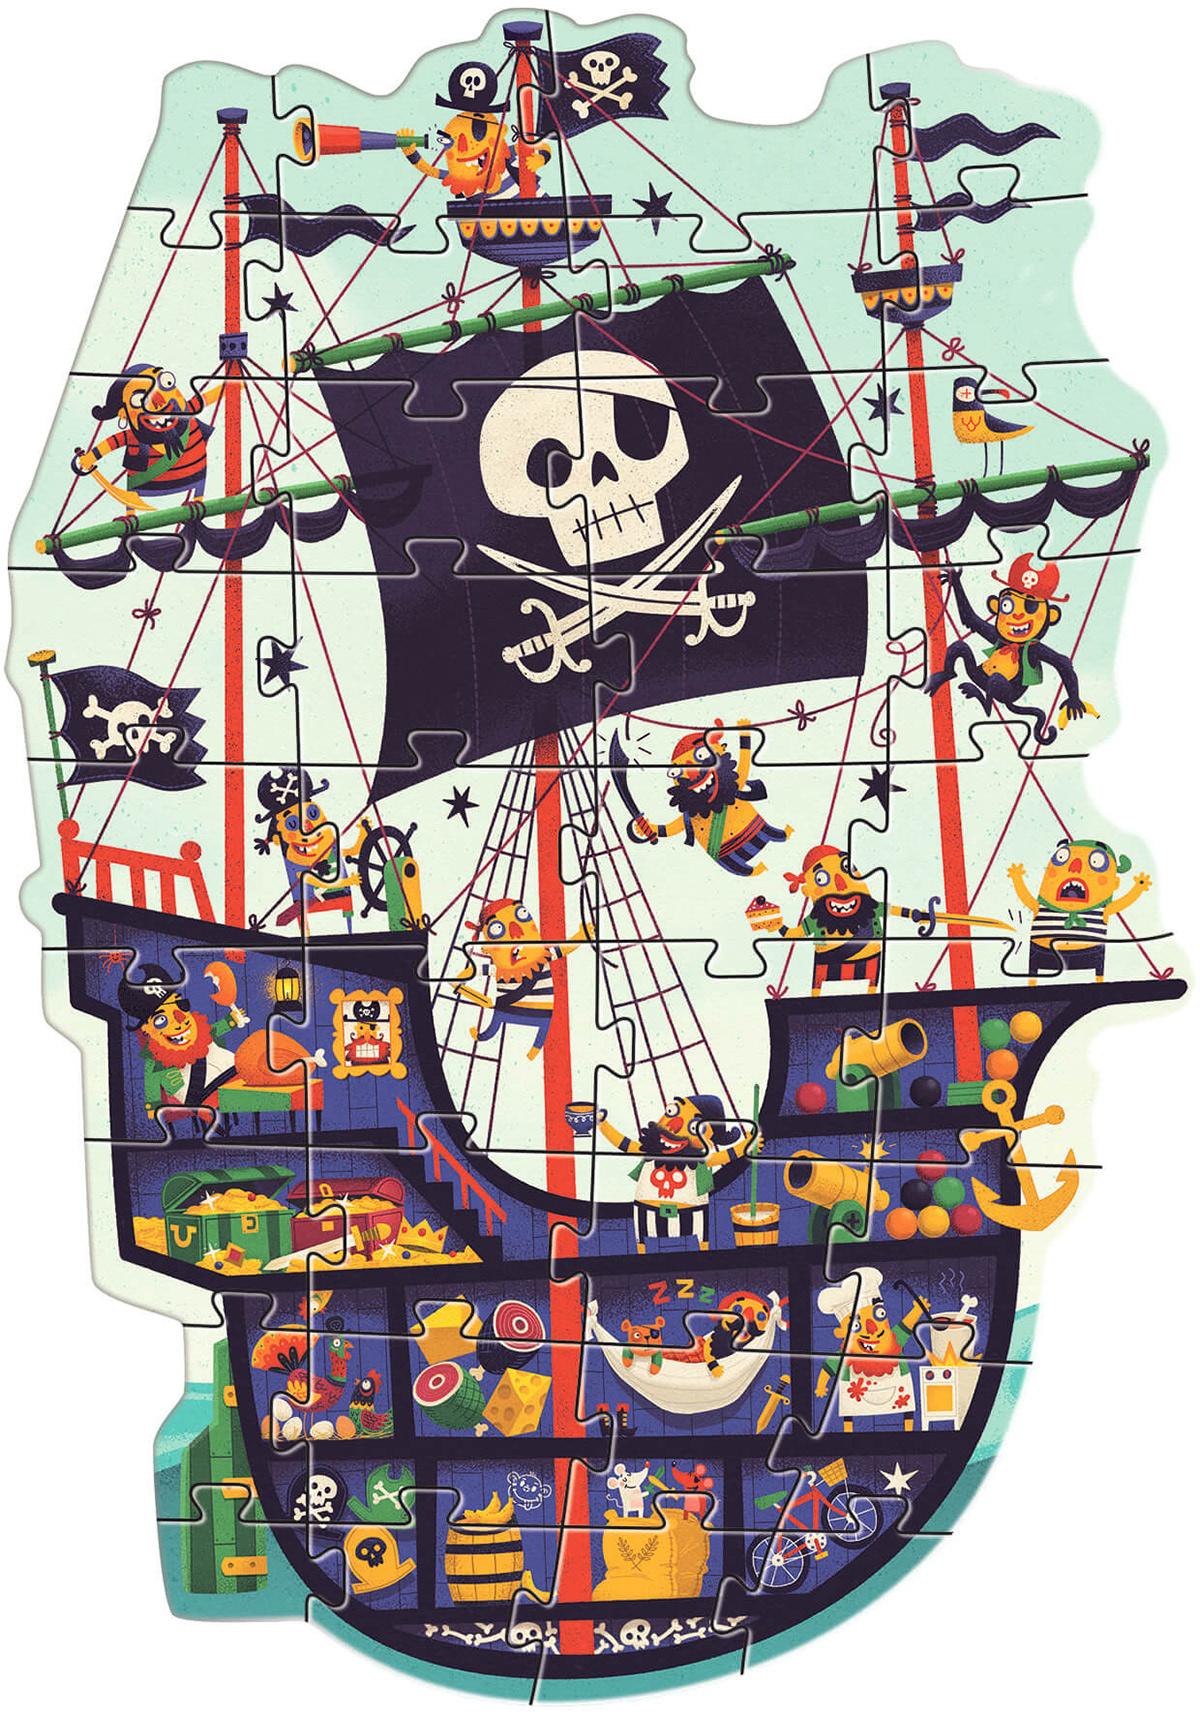 Pirate ship jigsaw by Steve Simpson